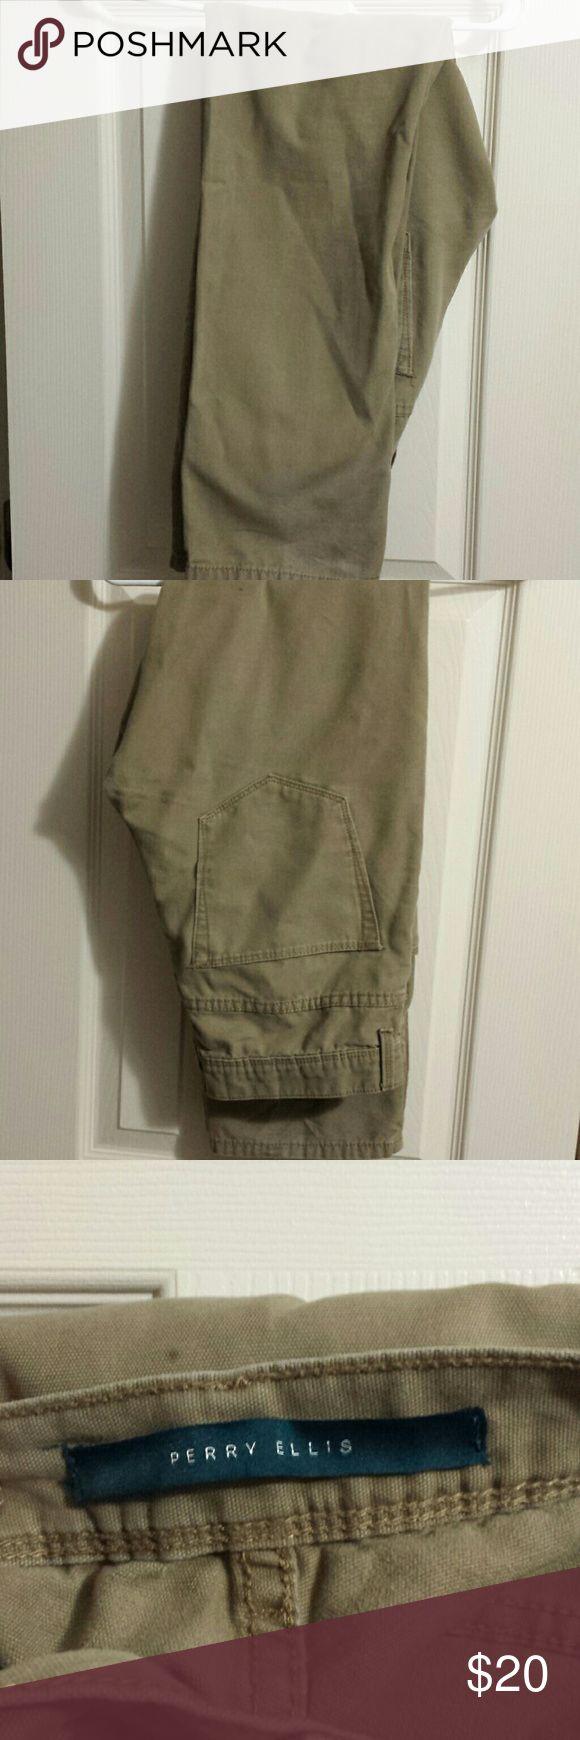 Khaki Pants Men's khaki Pants size 32x32 Perry Ellis Pants Chinos & Khakis